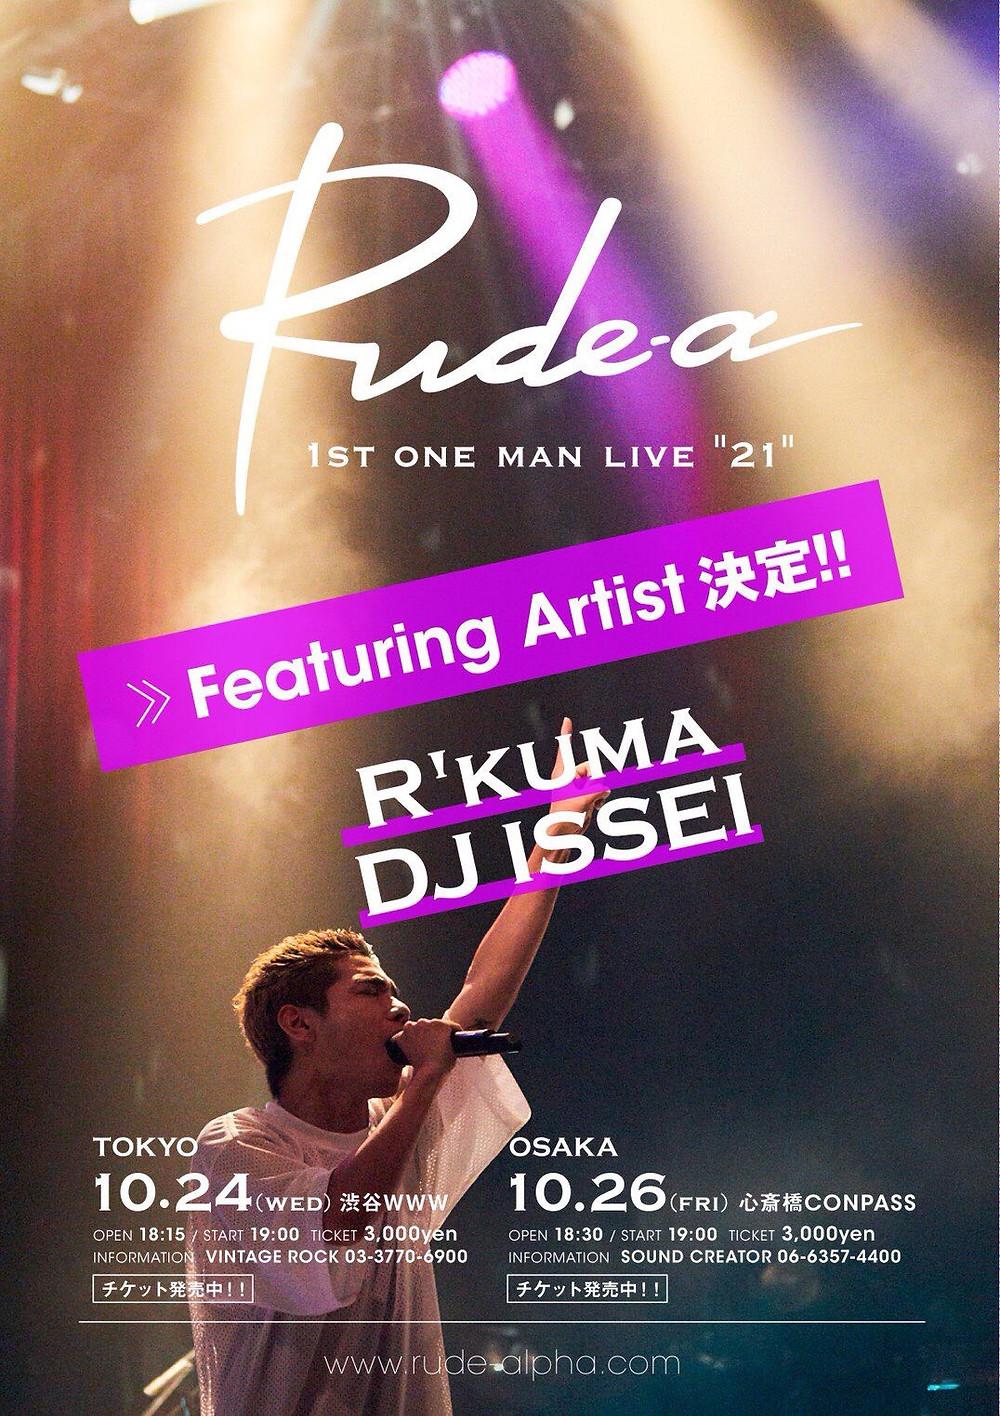 "Rude-α 1st one man live ""21"""